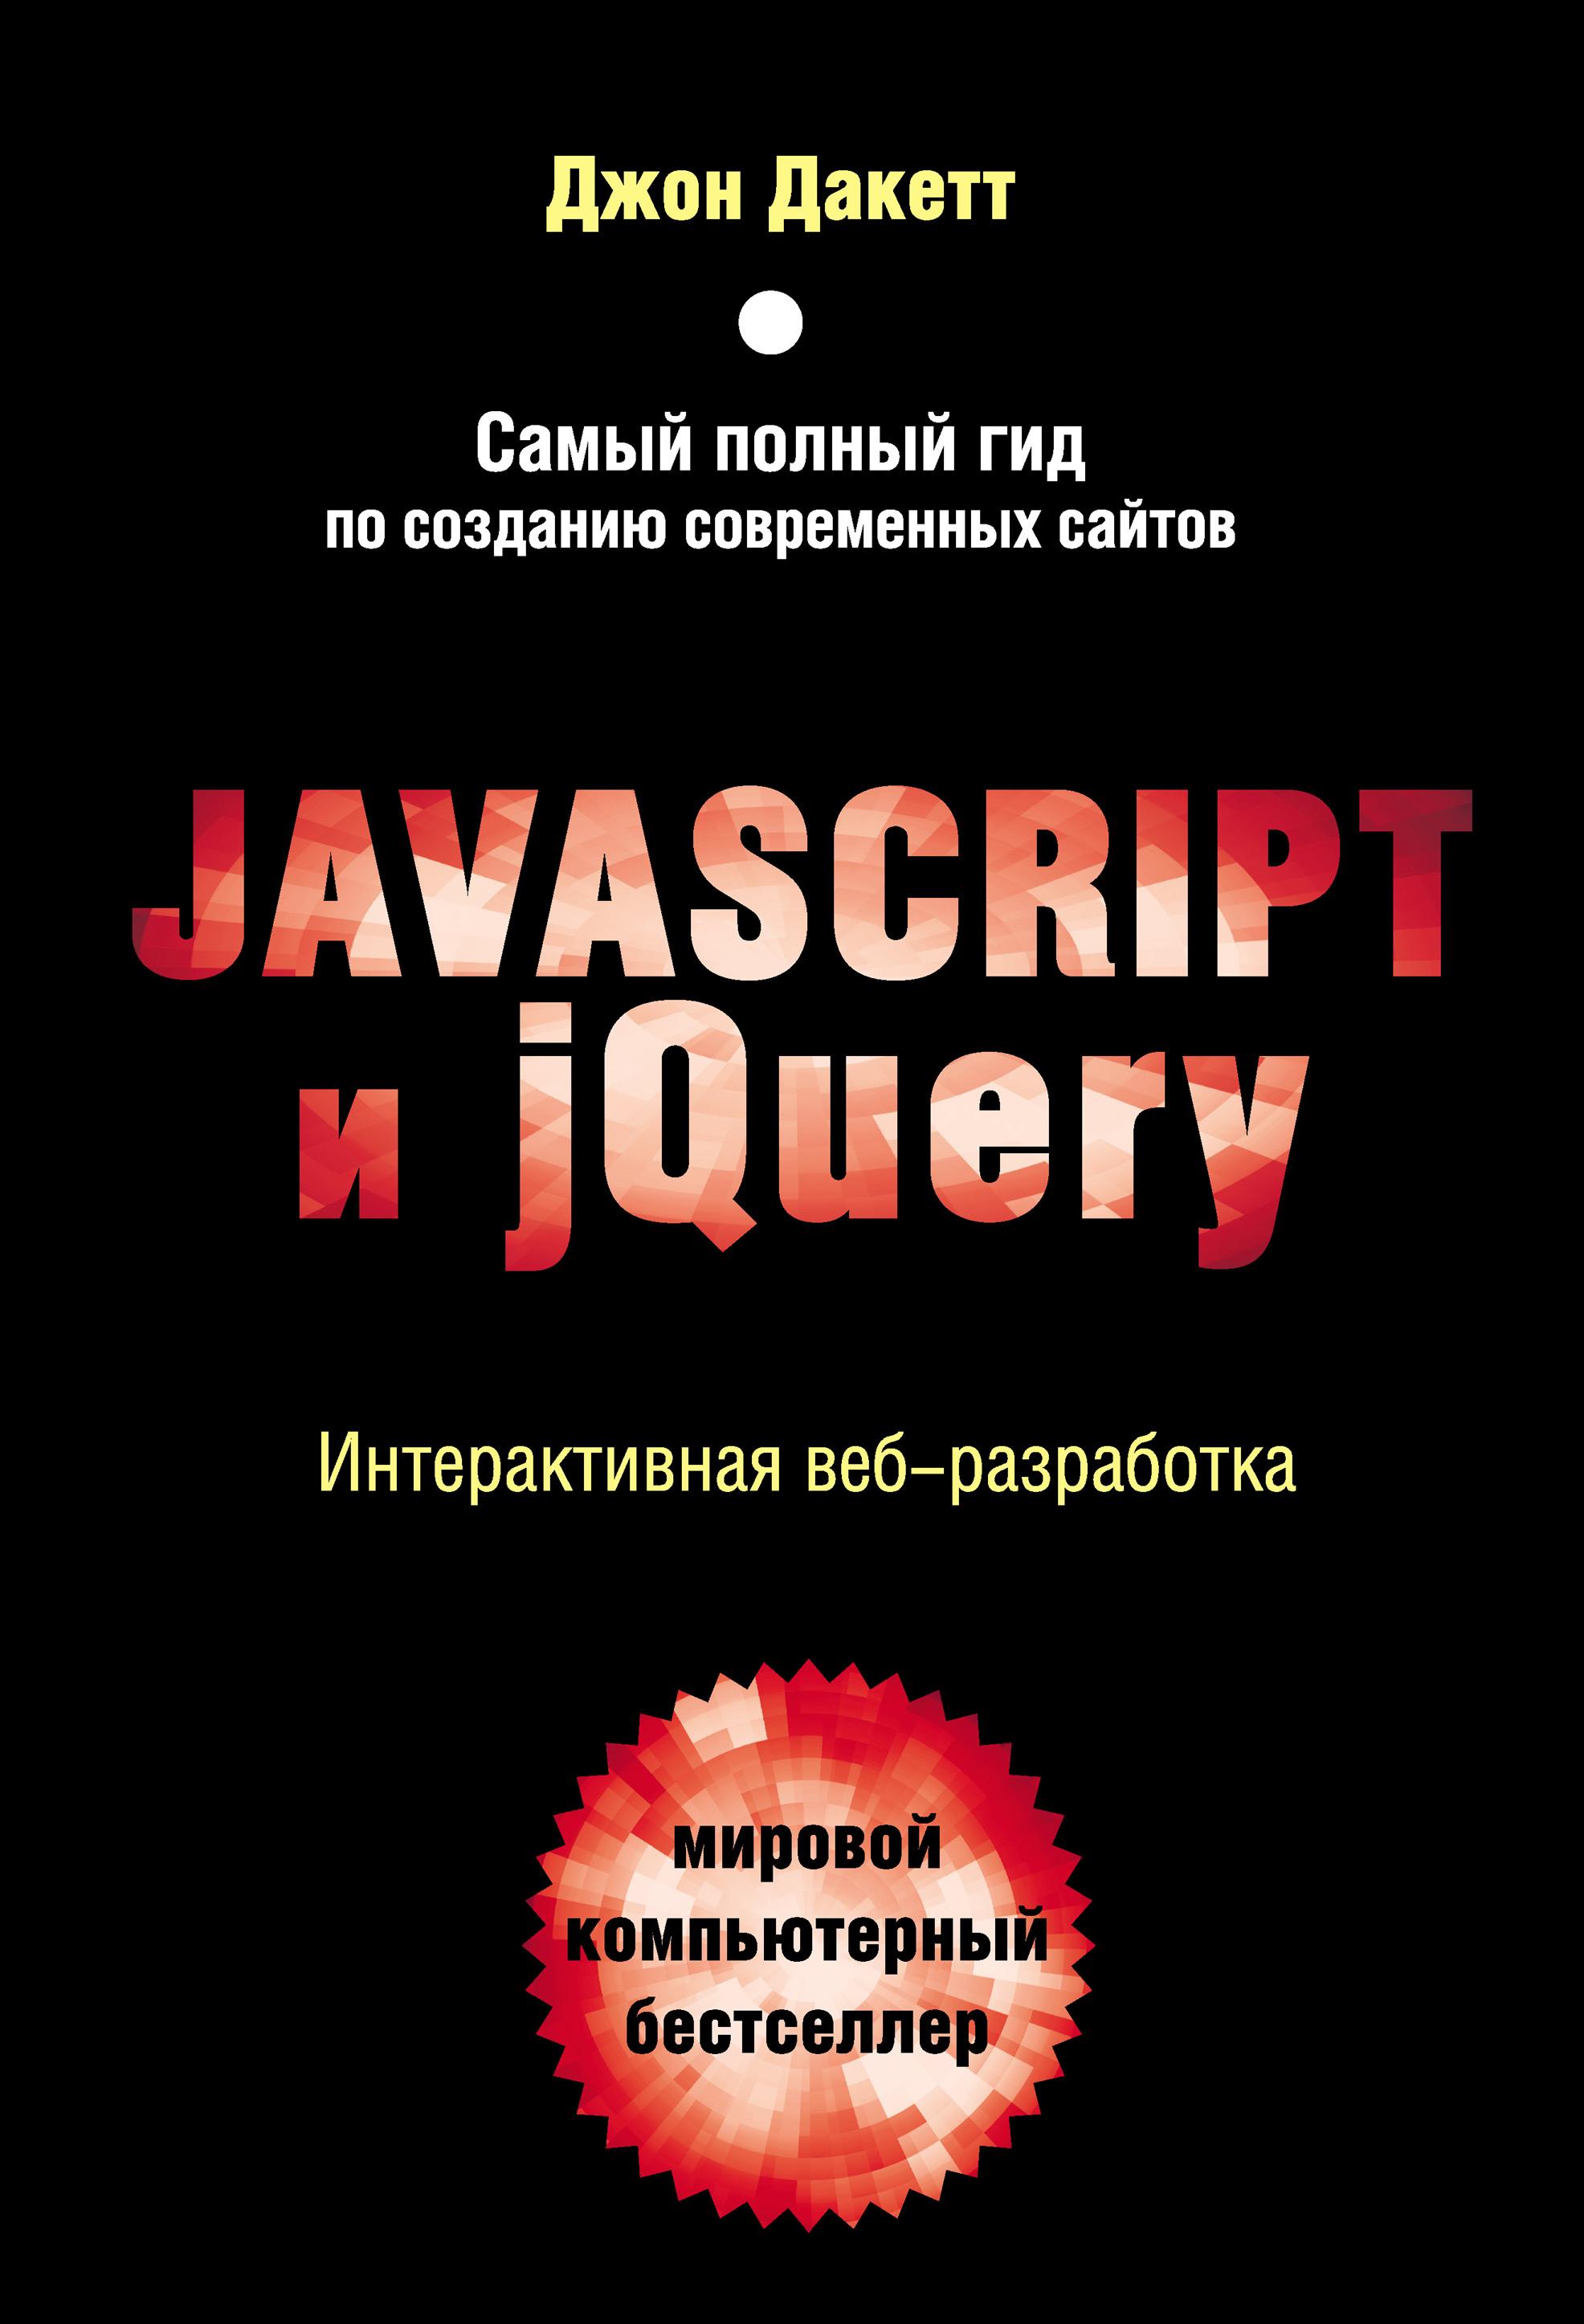 Джон Дакетт Javascript и jQuery. Интерактивная веб-разработка дэвид хантер джефф рафтер джо фосетт эрик ван дер влист дэнни айерс джон дакетт эндрю уатт линда мак киннон xml базовый курс